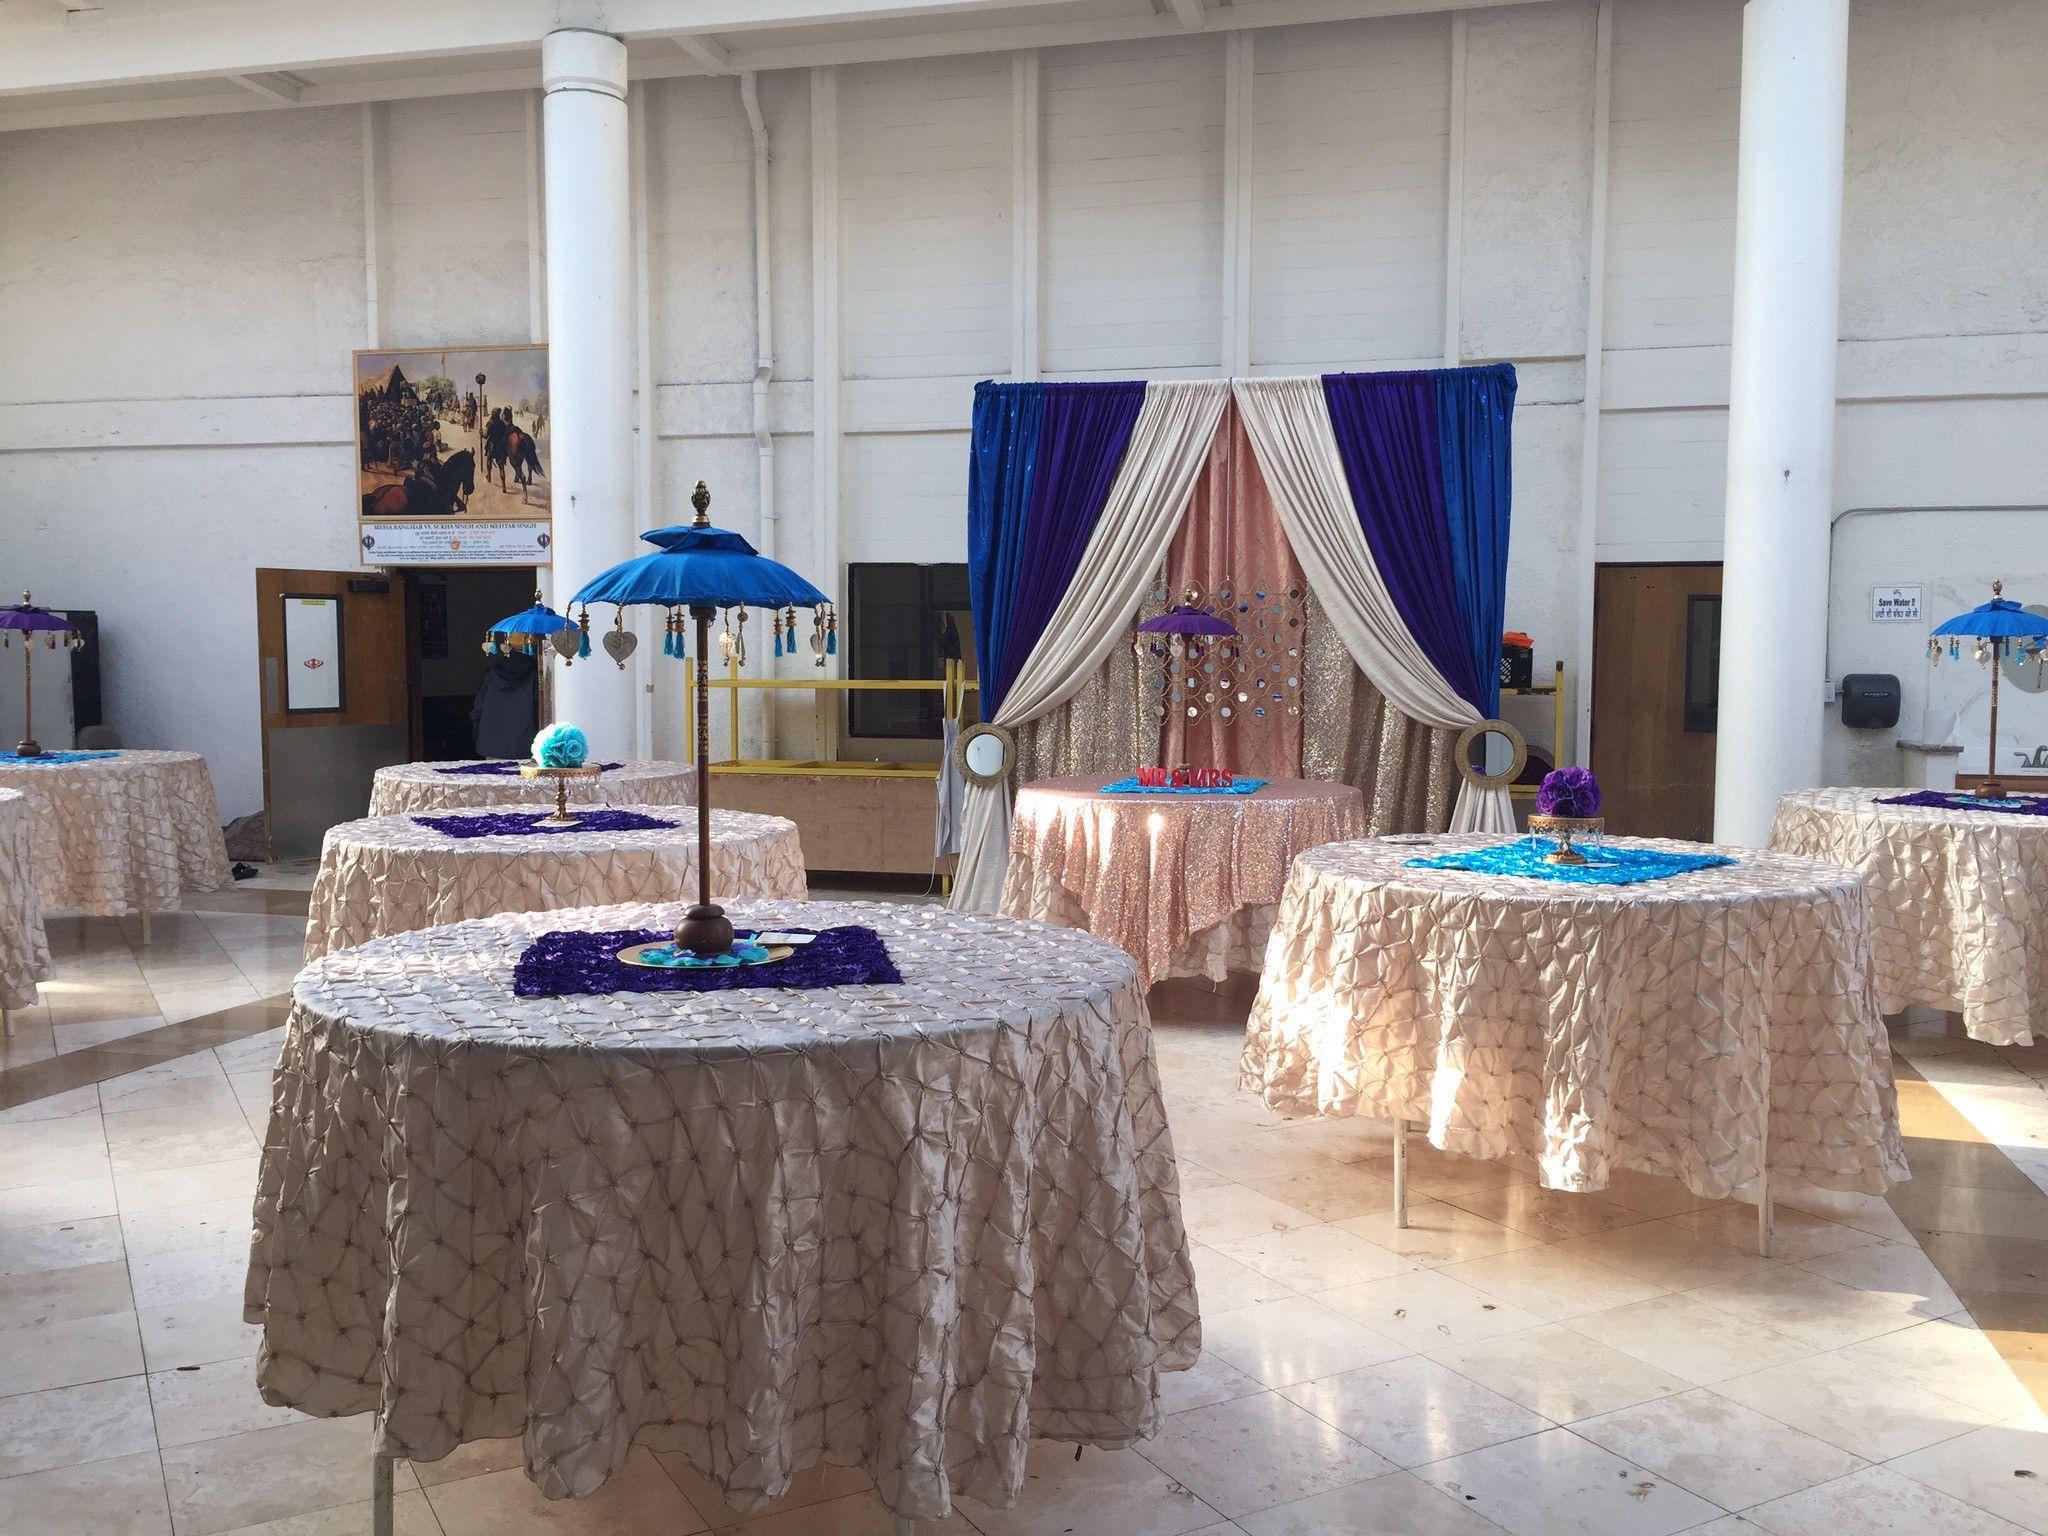 Rr event rentals bay area indian wedding decorations wedding rr event rentals bay area indian wedding decorations junglespirit Images